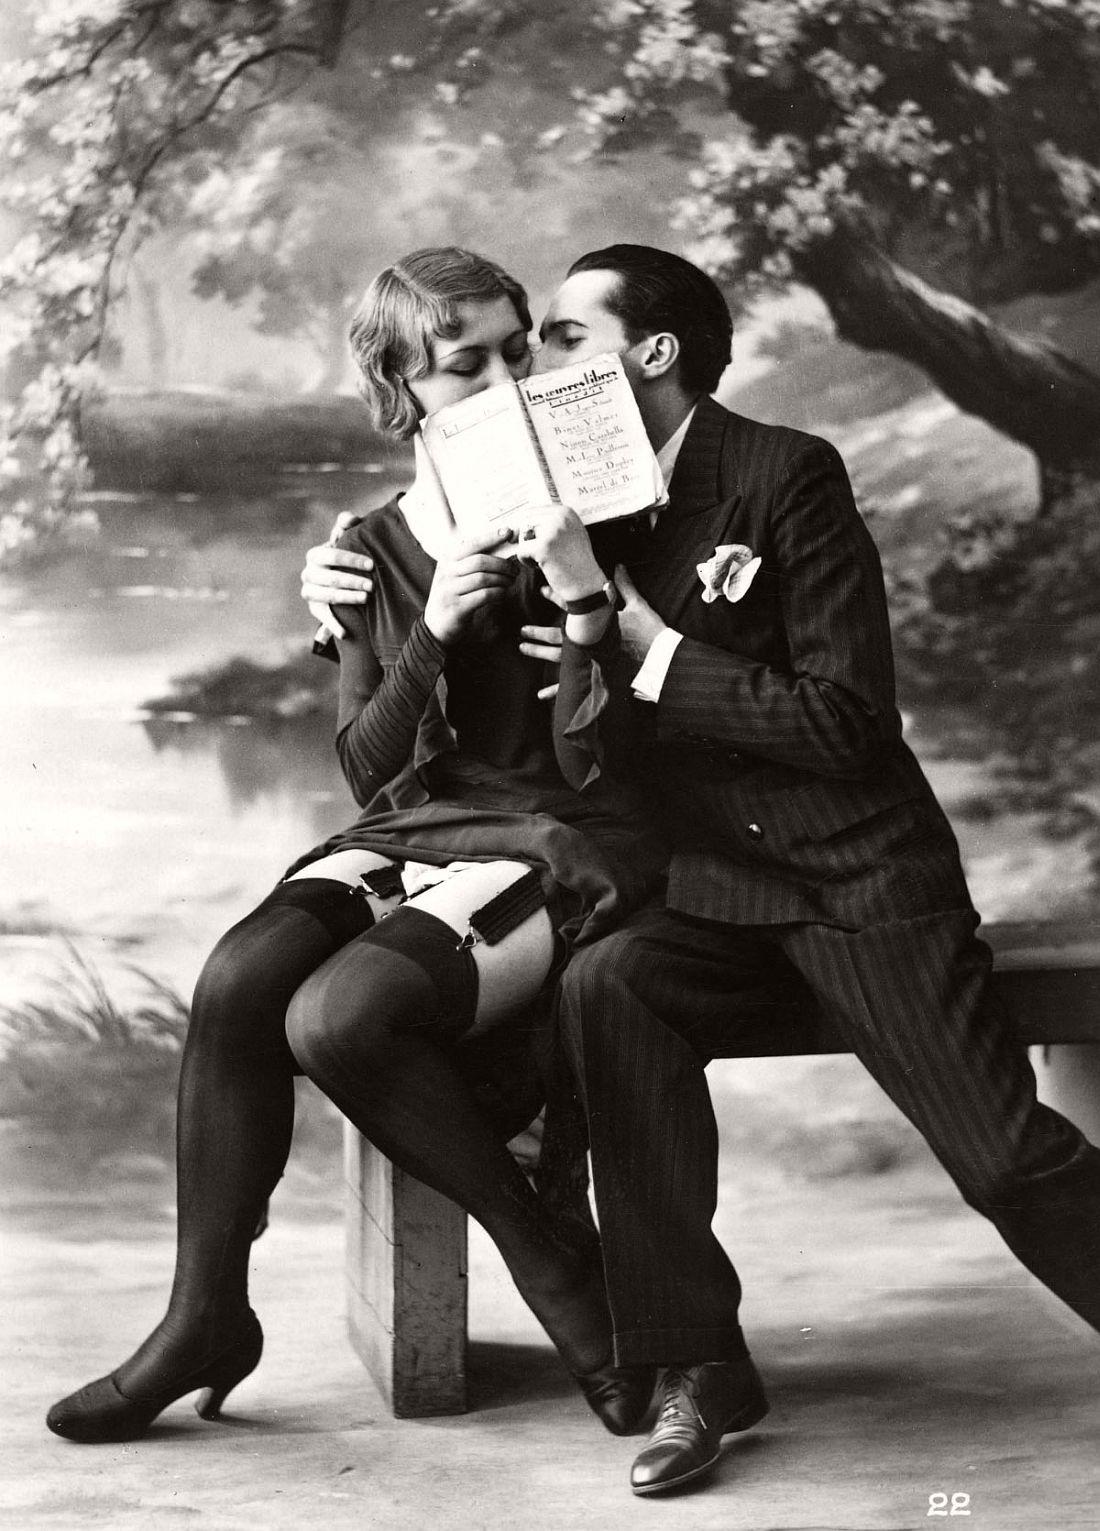 Vintage French Erotic Postcards 1920s Monovisions